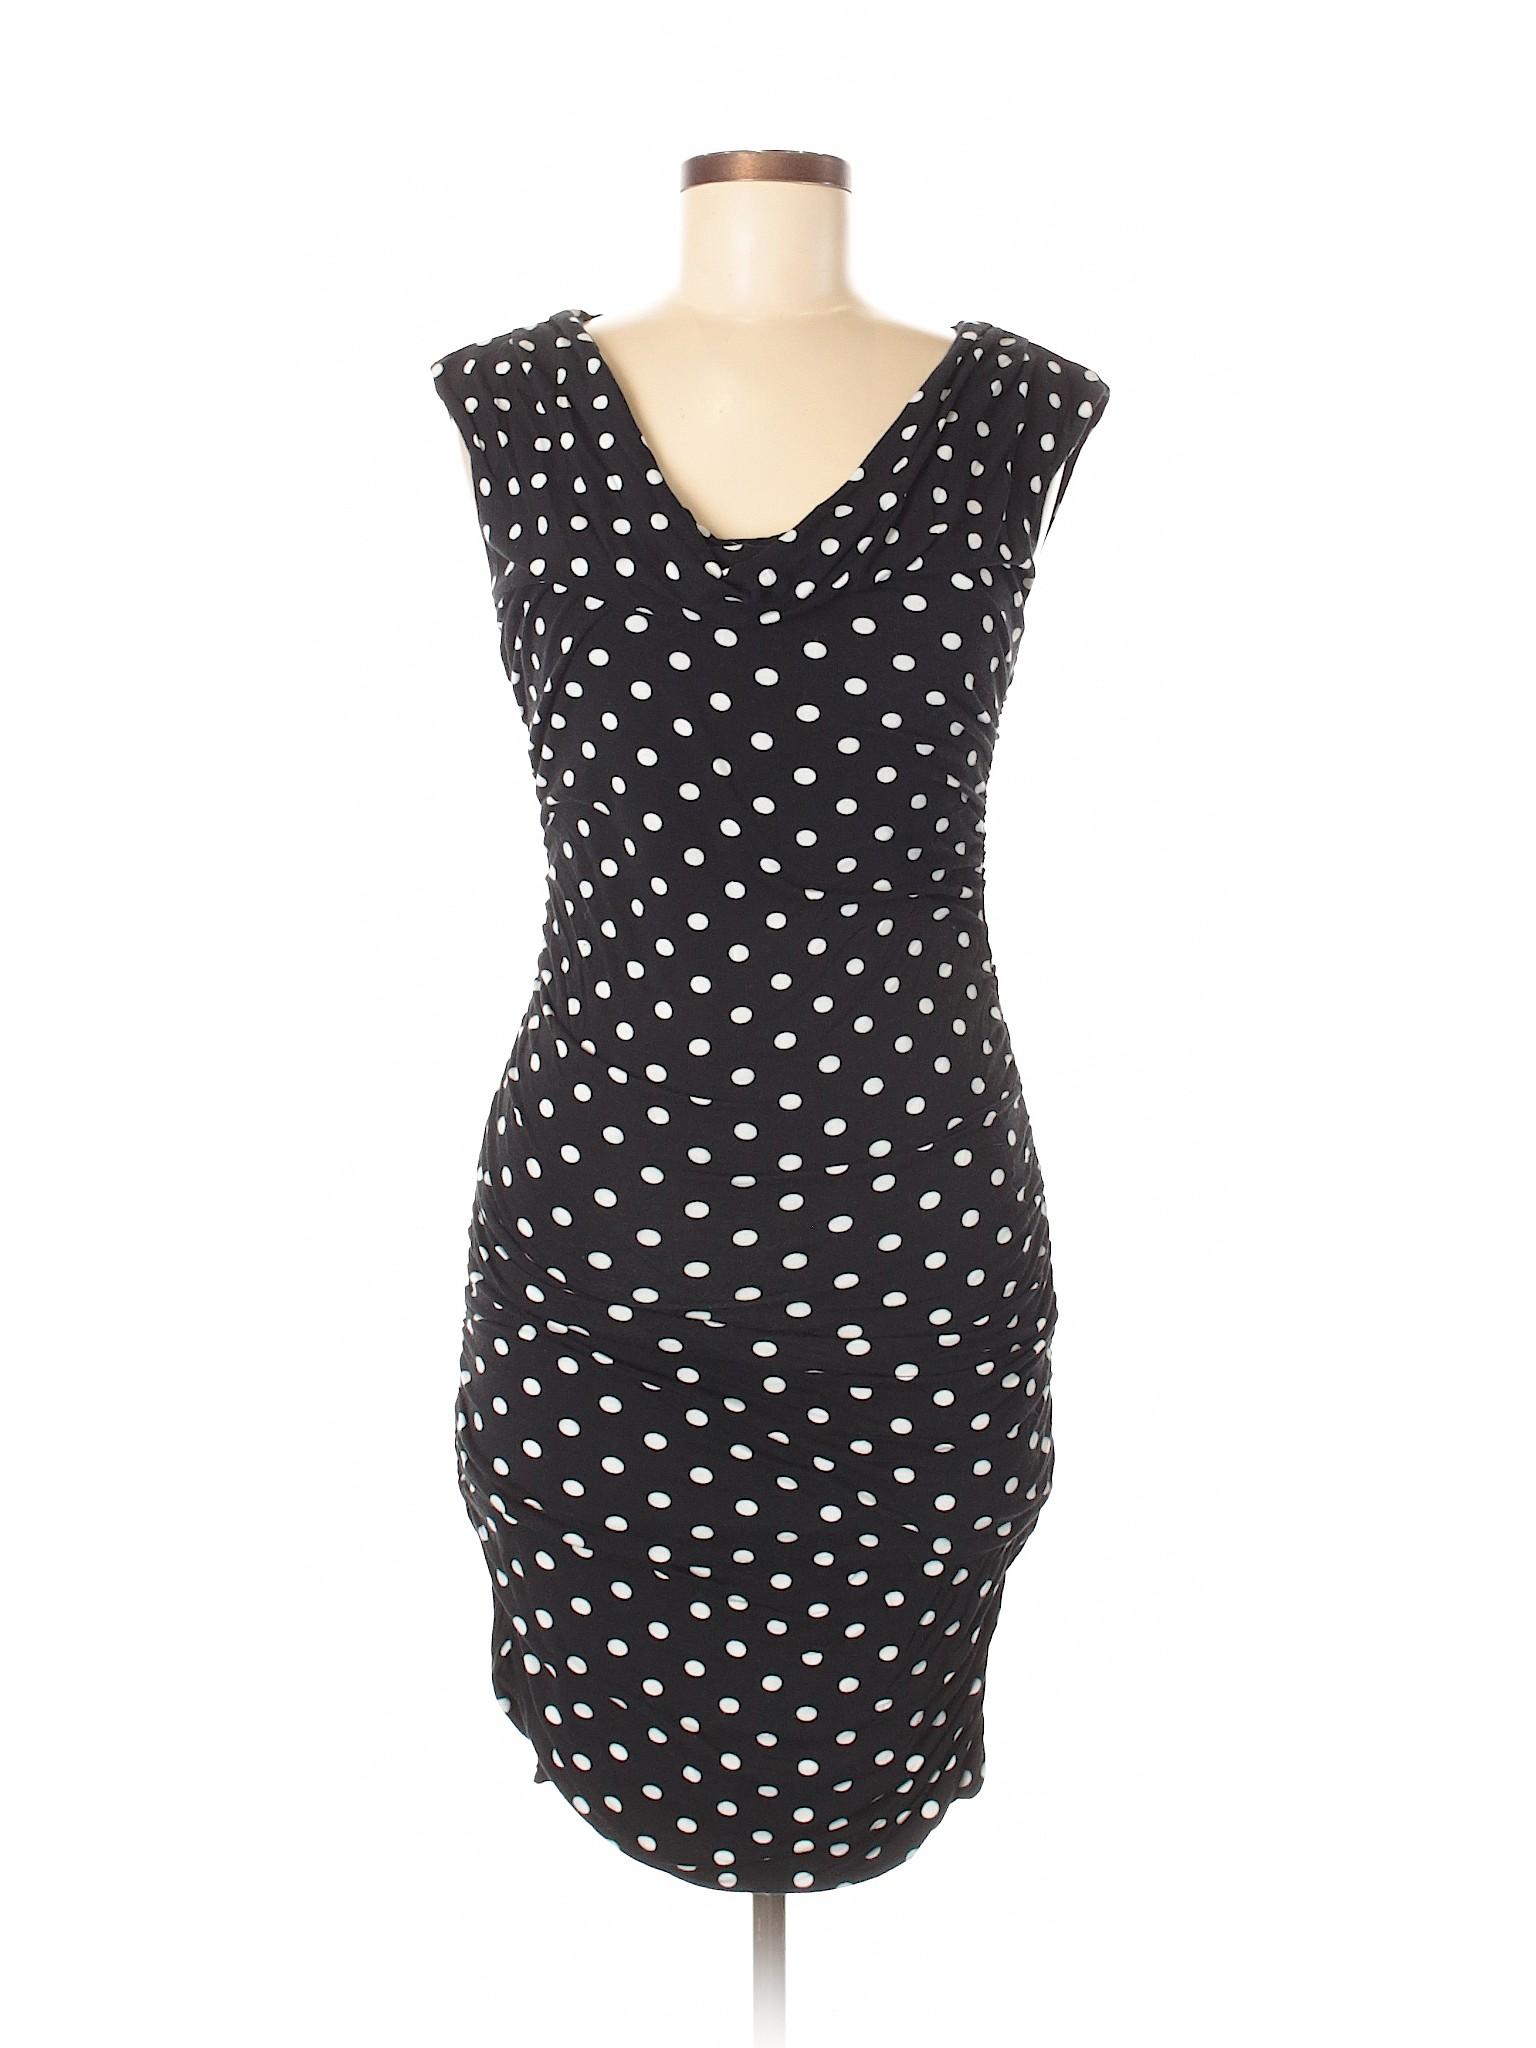 Concepts INC Boutique International Dress Casual winter qBRRwH6